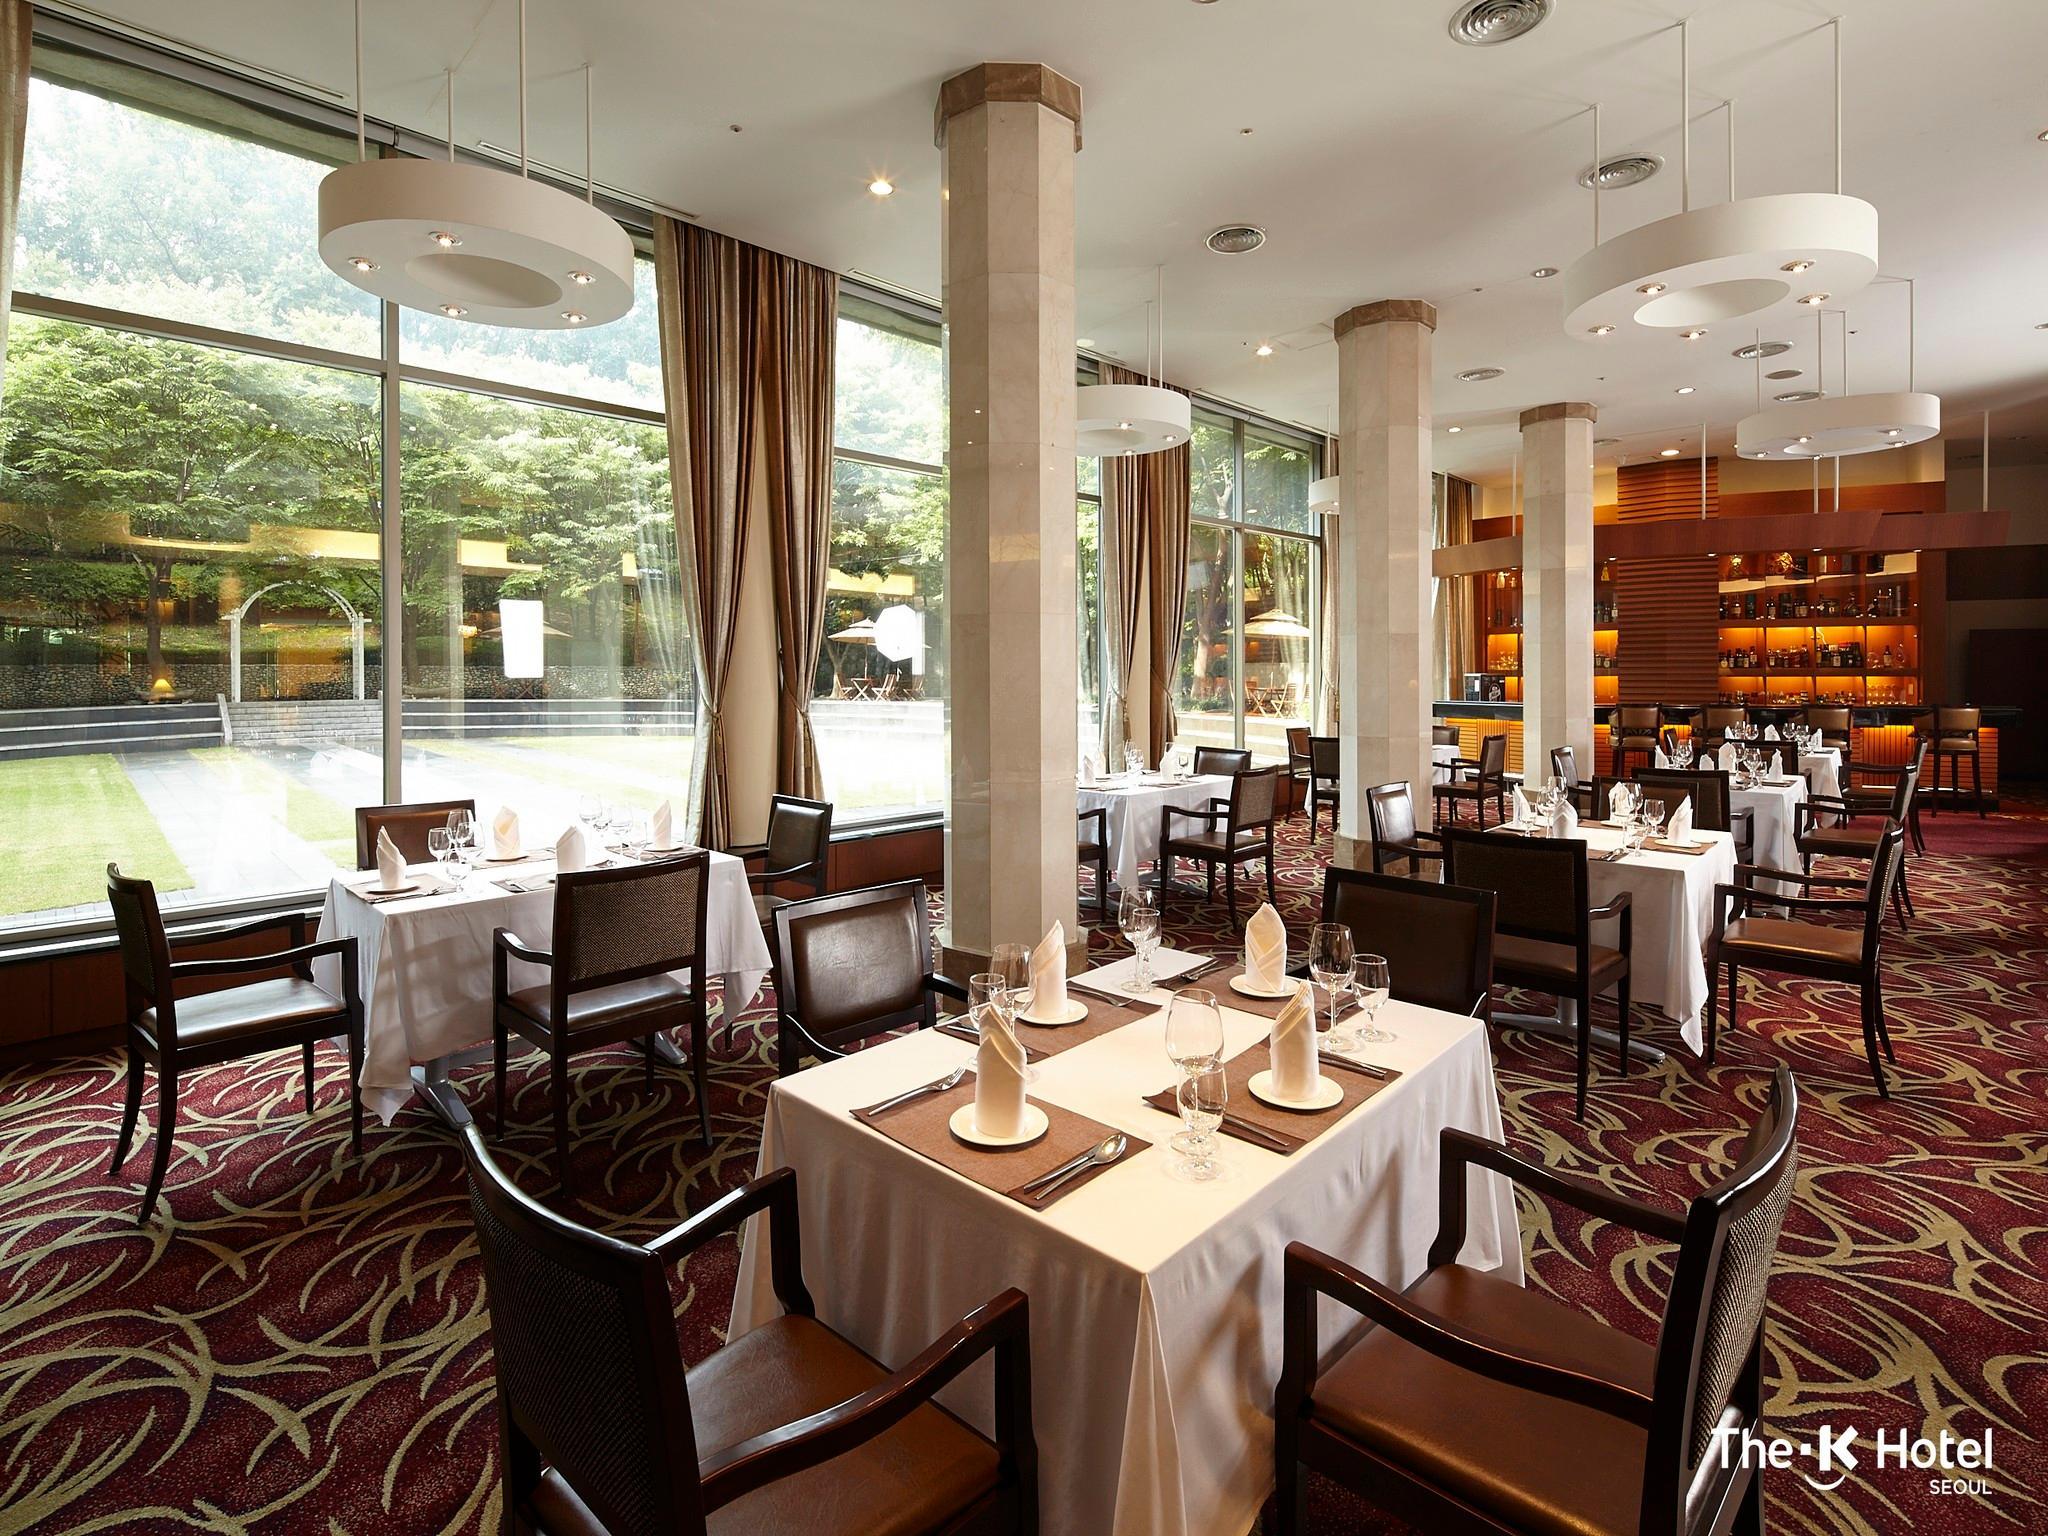 Hotel Amman  300m from Seminyak Square - Kuta Utara Bali 80361 Indonesia - Bali